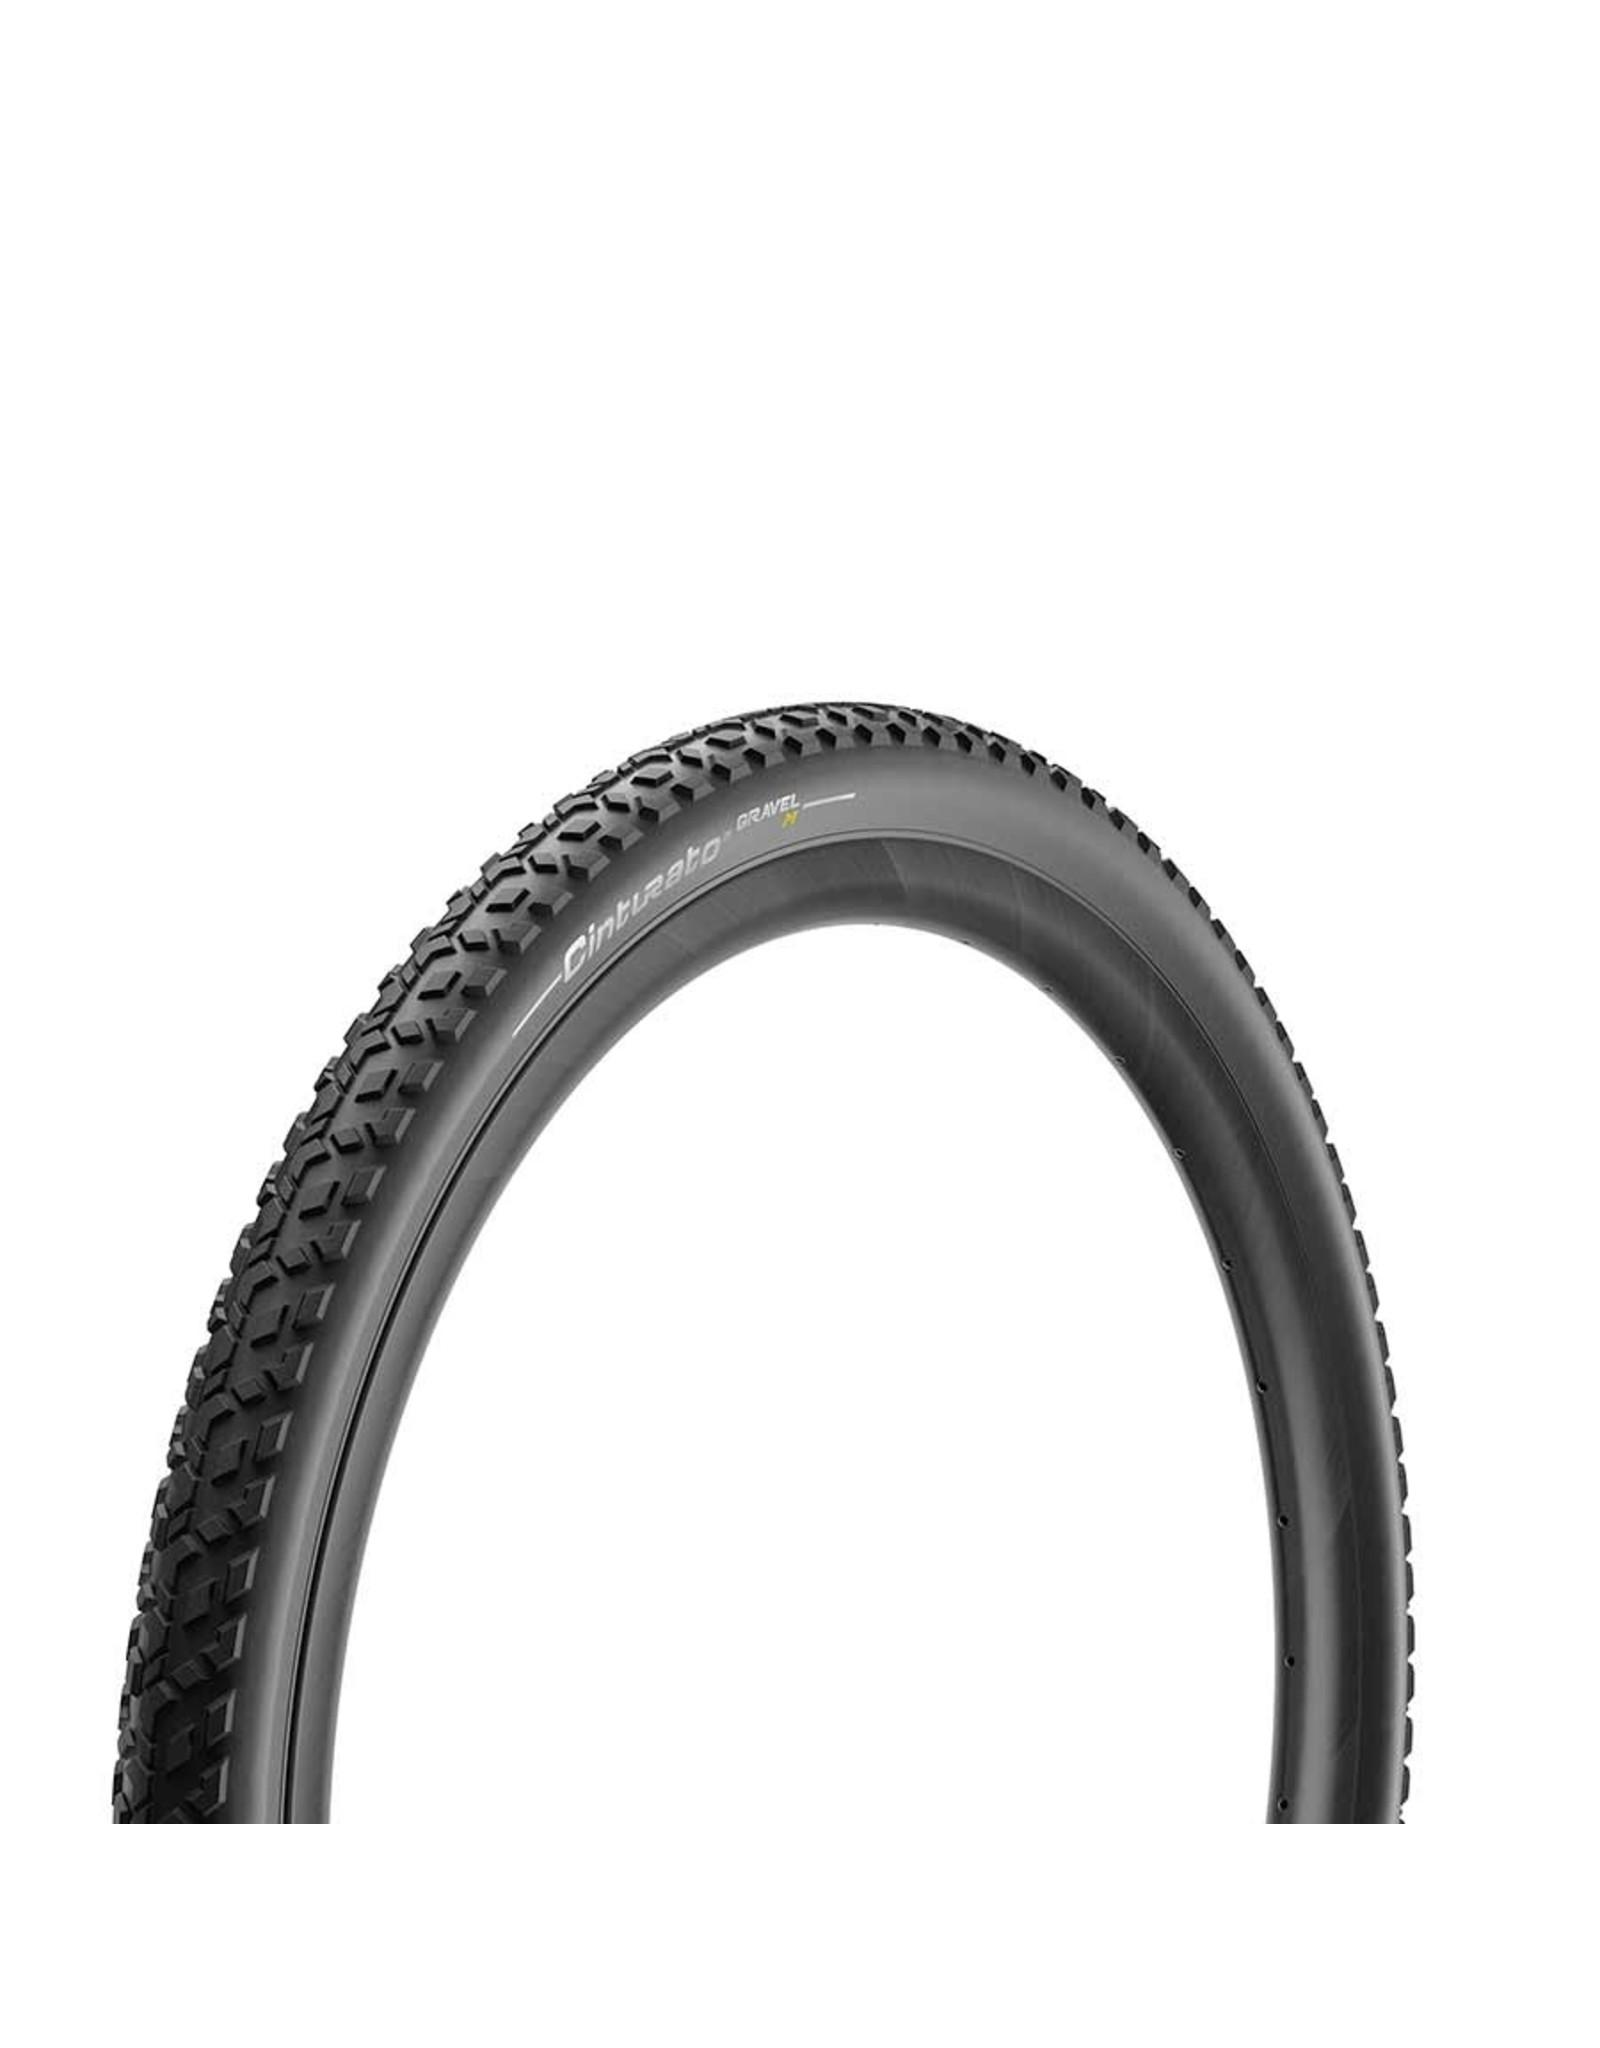 Pirelli, Cinturato Gravel M, Tire, 700x45C, Folding, Tubeless Ready, SpeedGrip, 127TPI, Black